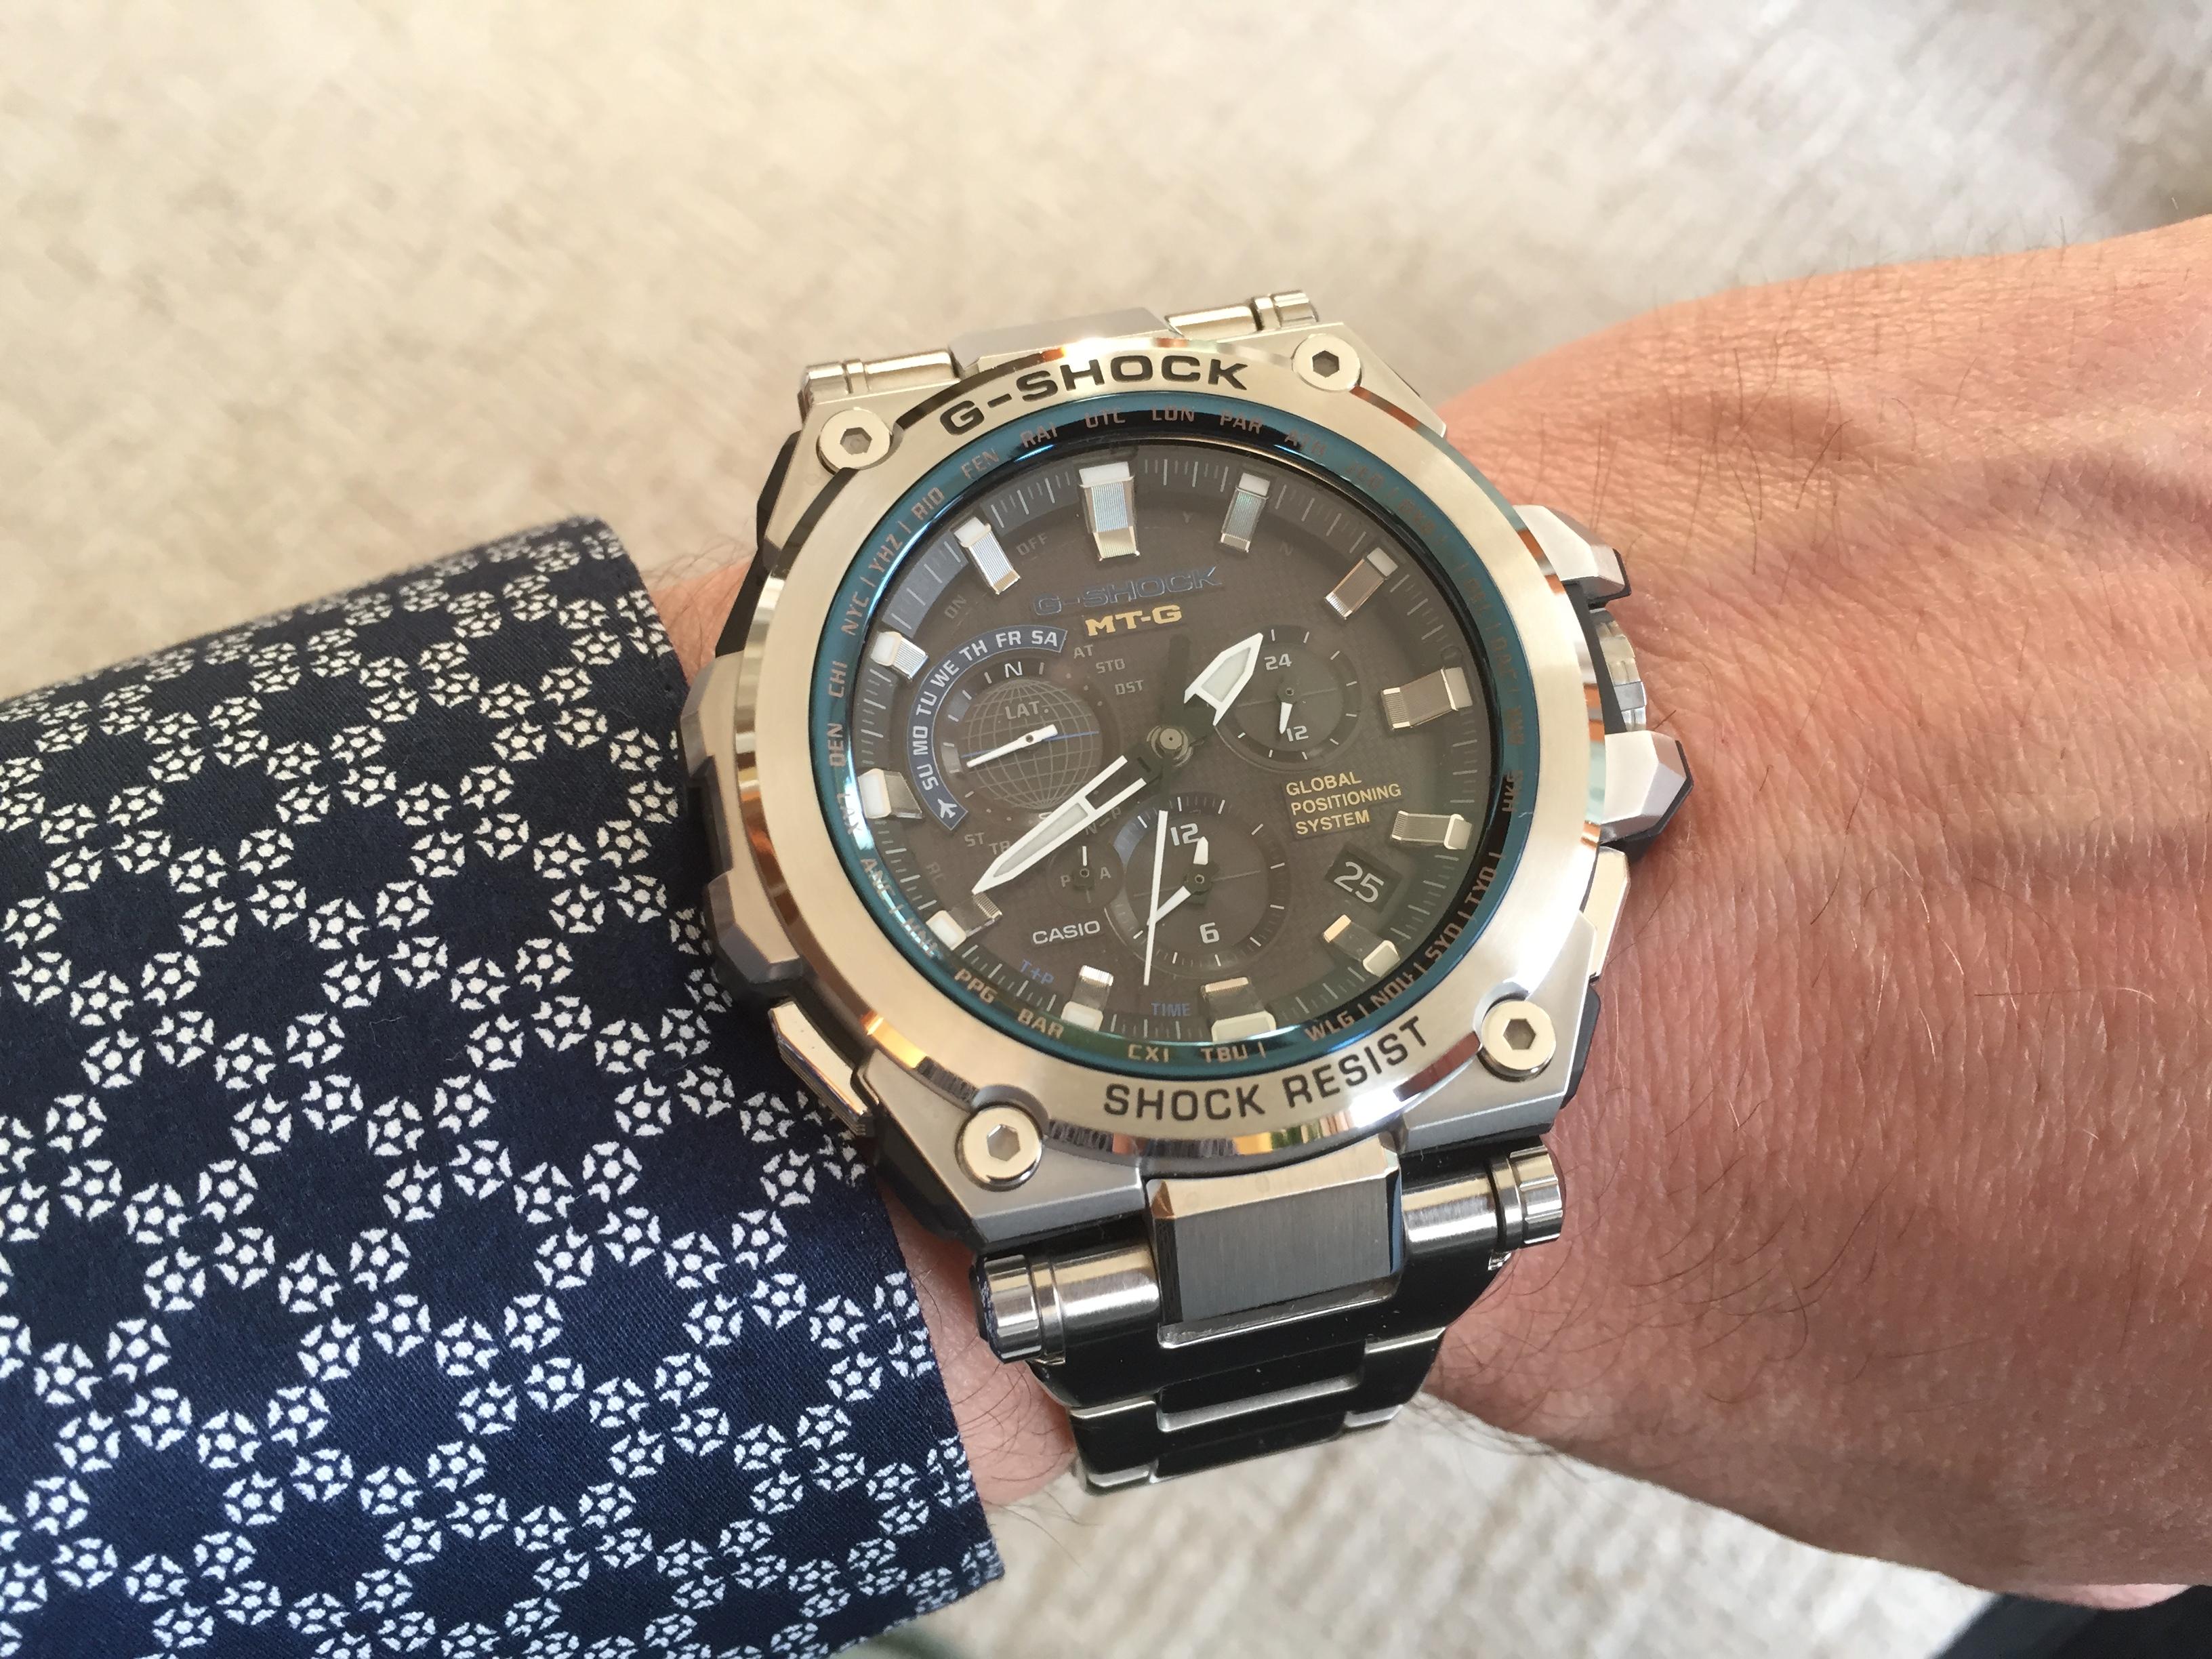 53d72b79a8b79 Gents Casio Premium G-Shock MT-G GPS Alarm Chronograph Watch (MTG ...